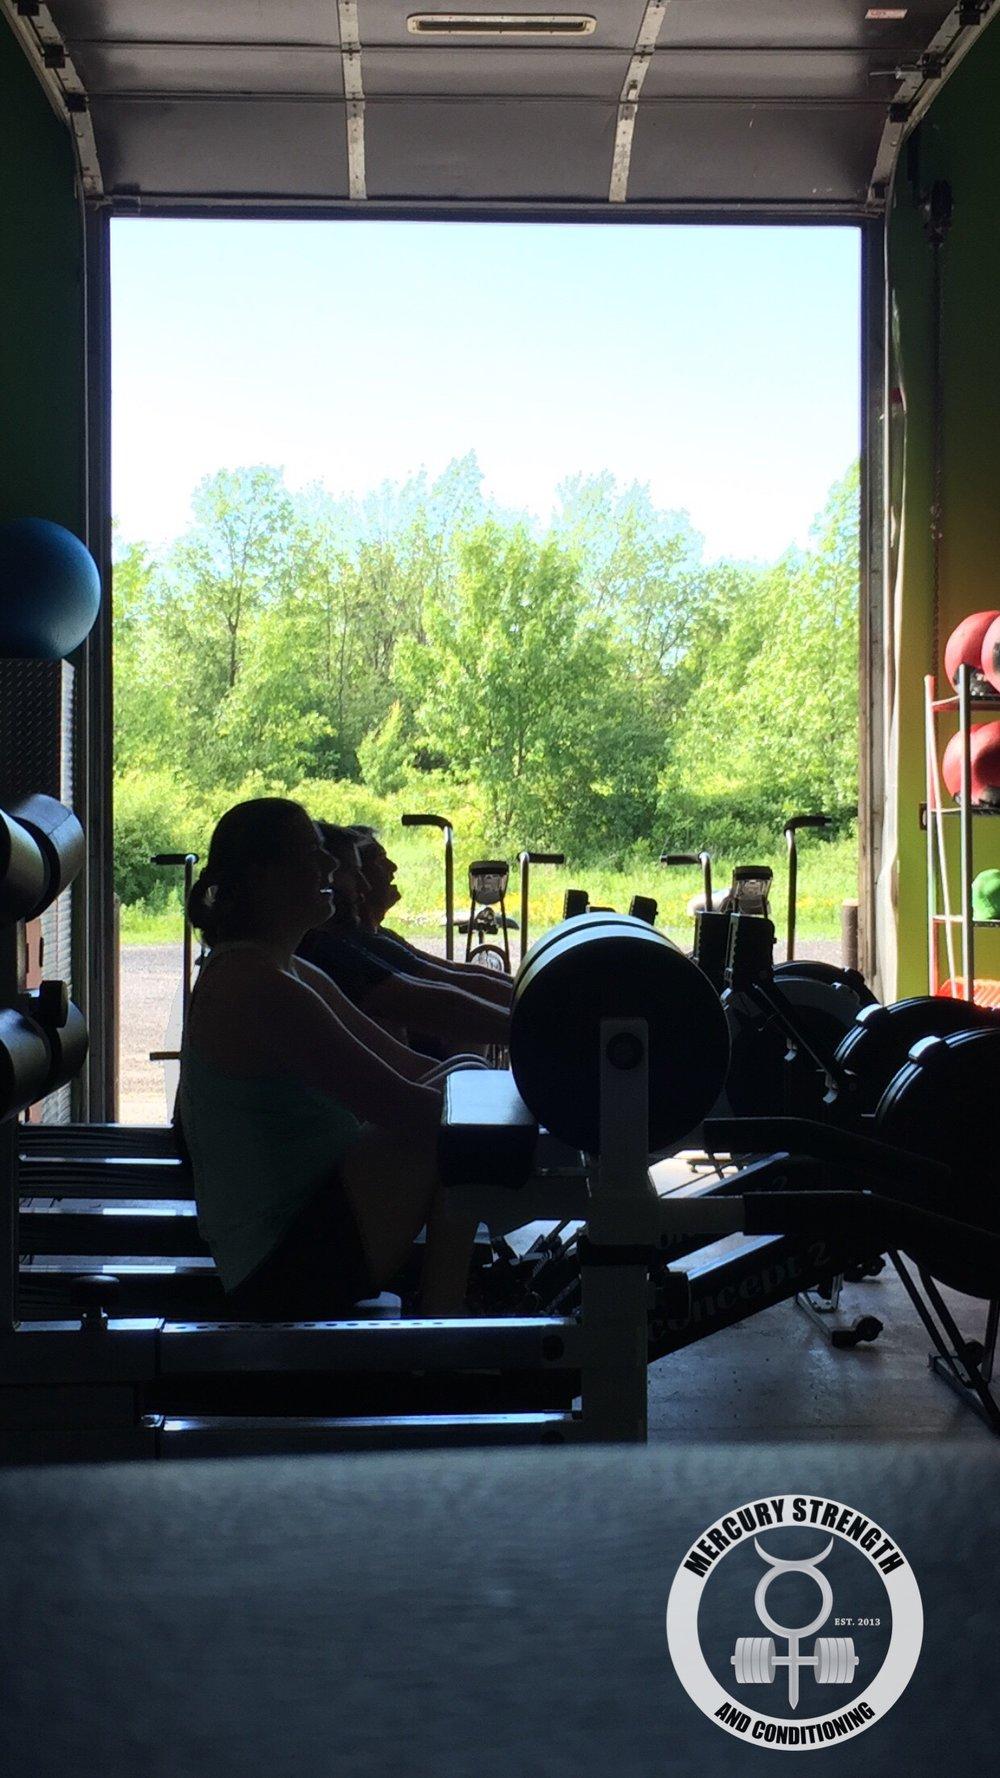 Gym-powerlifting-Olympic lifting-fitness-personal training-training-bootcamp-crossfit-kingston-kingston gym-kids-mercury-strength-conditioning-athlete-row